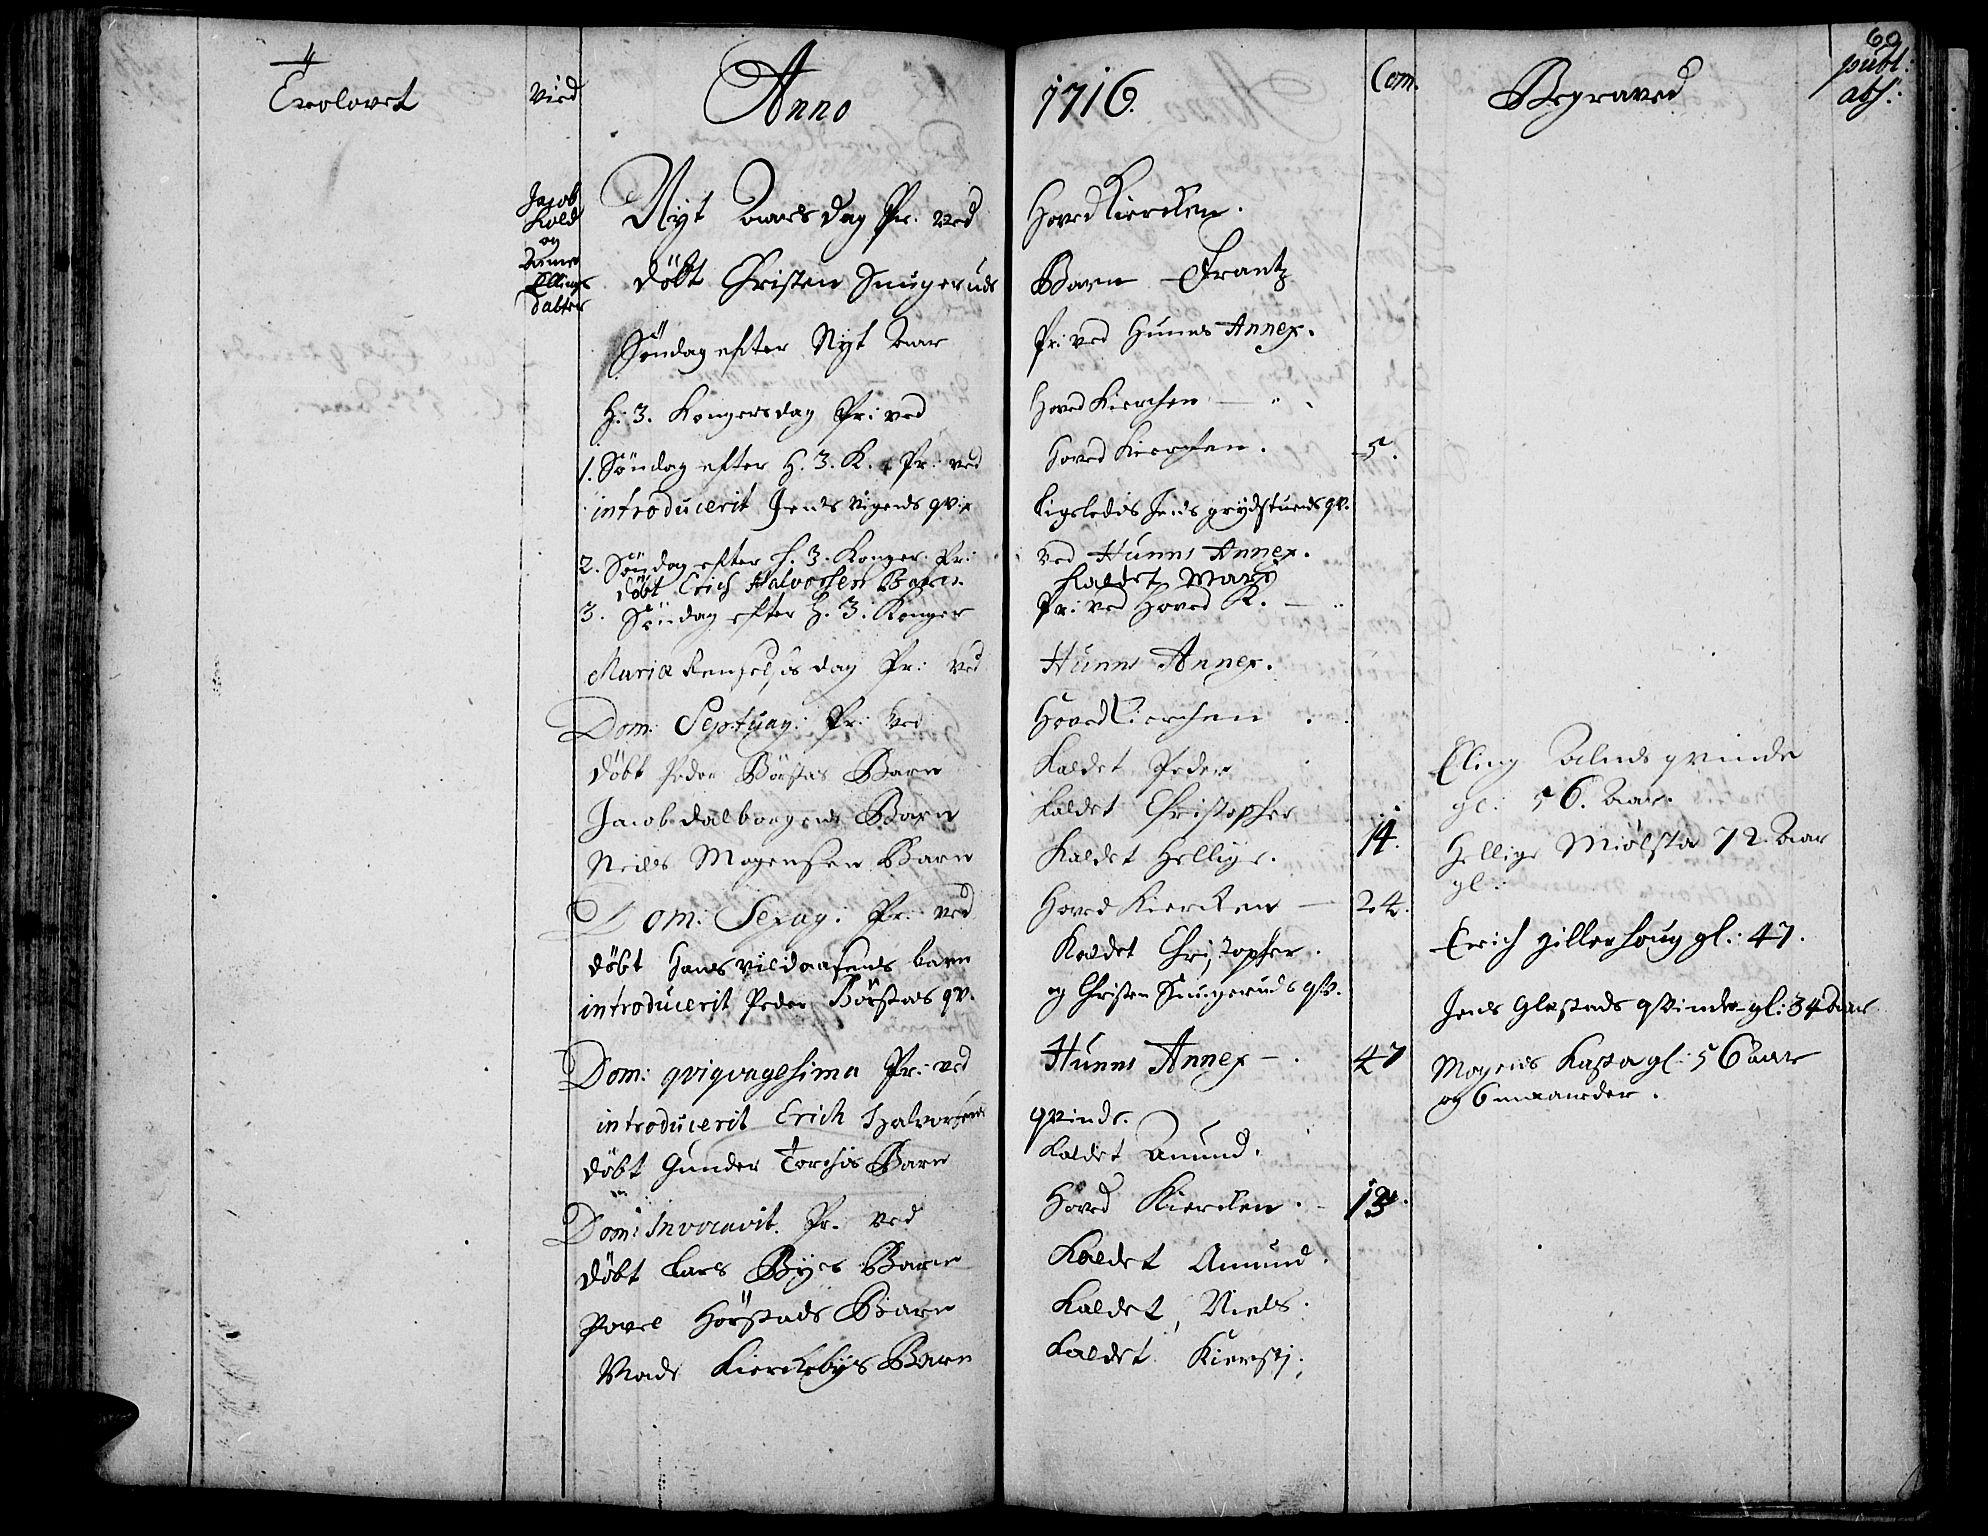 SAH, Vardal prestekontor, H/Ha/Haa/L0001: Ministerialbok nr. 1, 1706-1748, s. 60